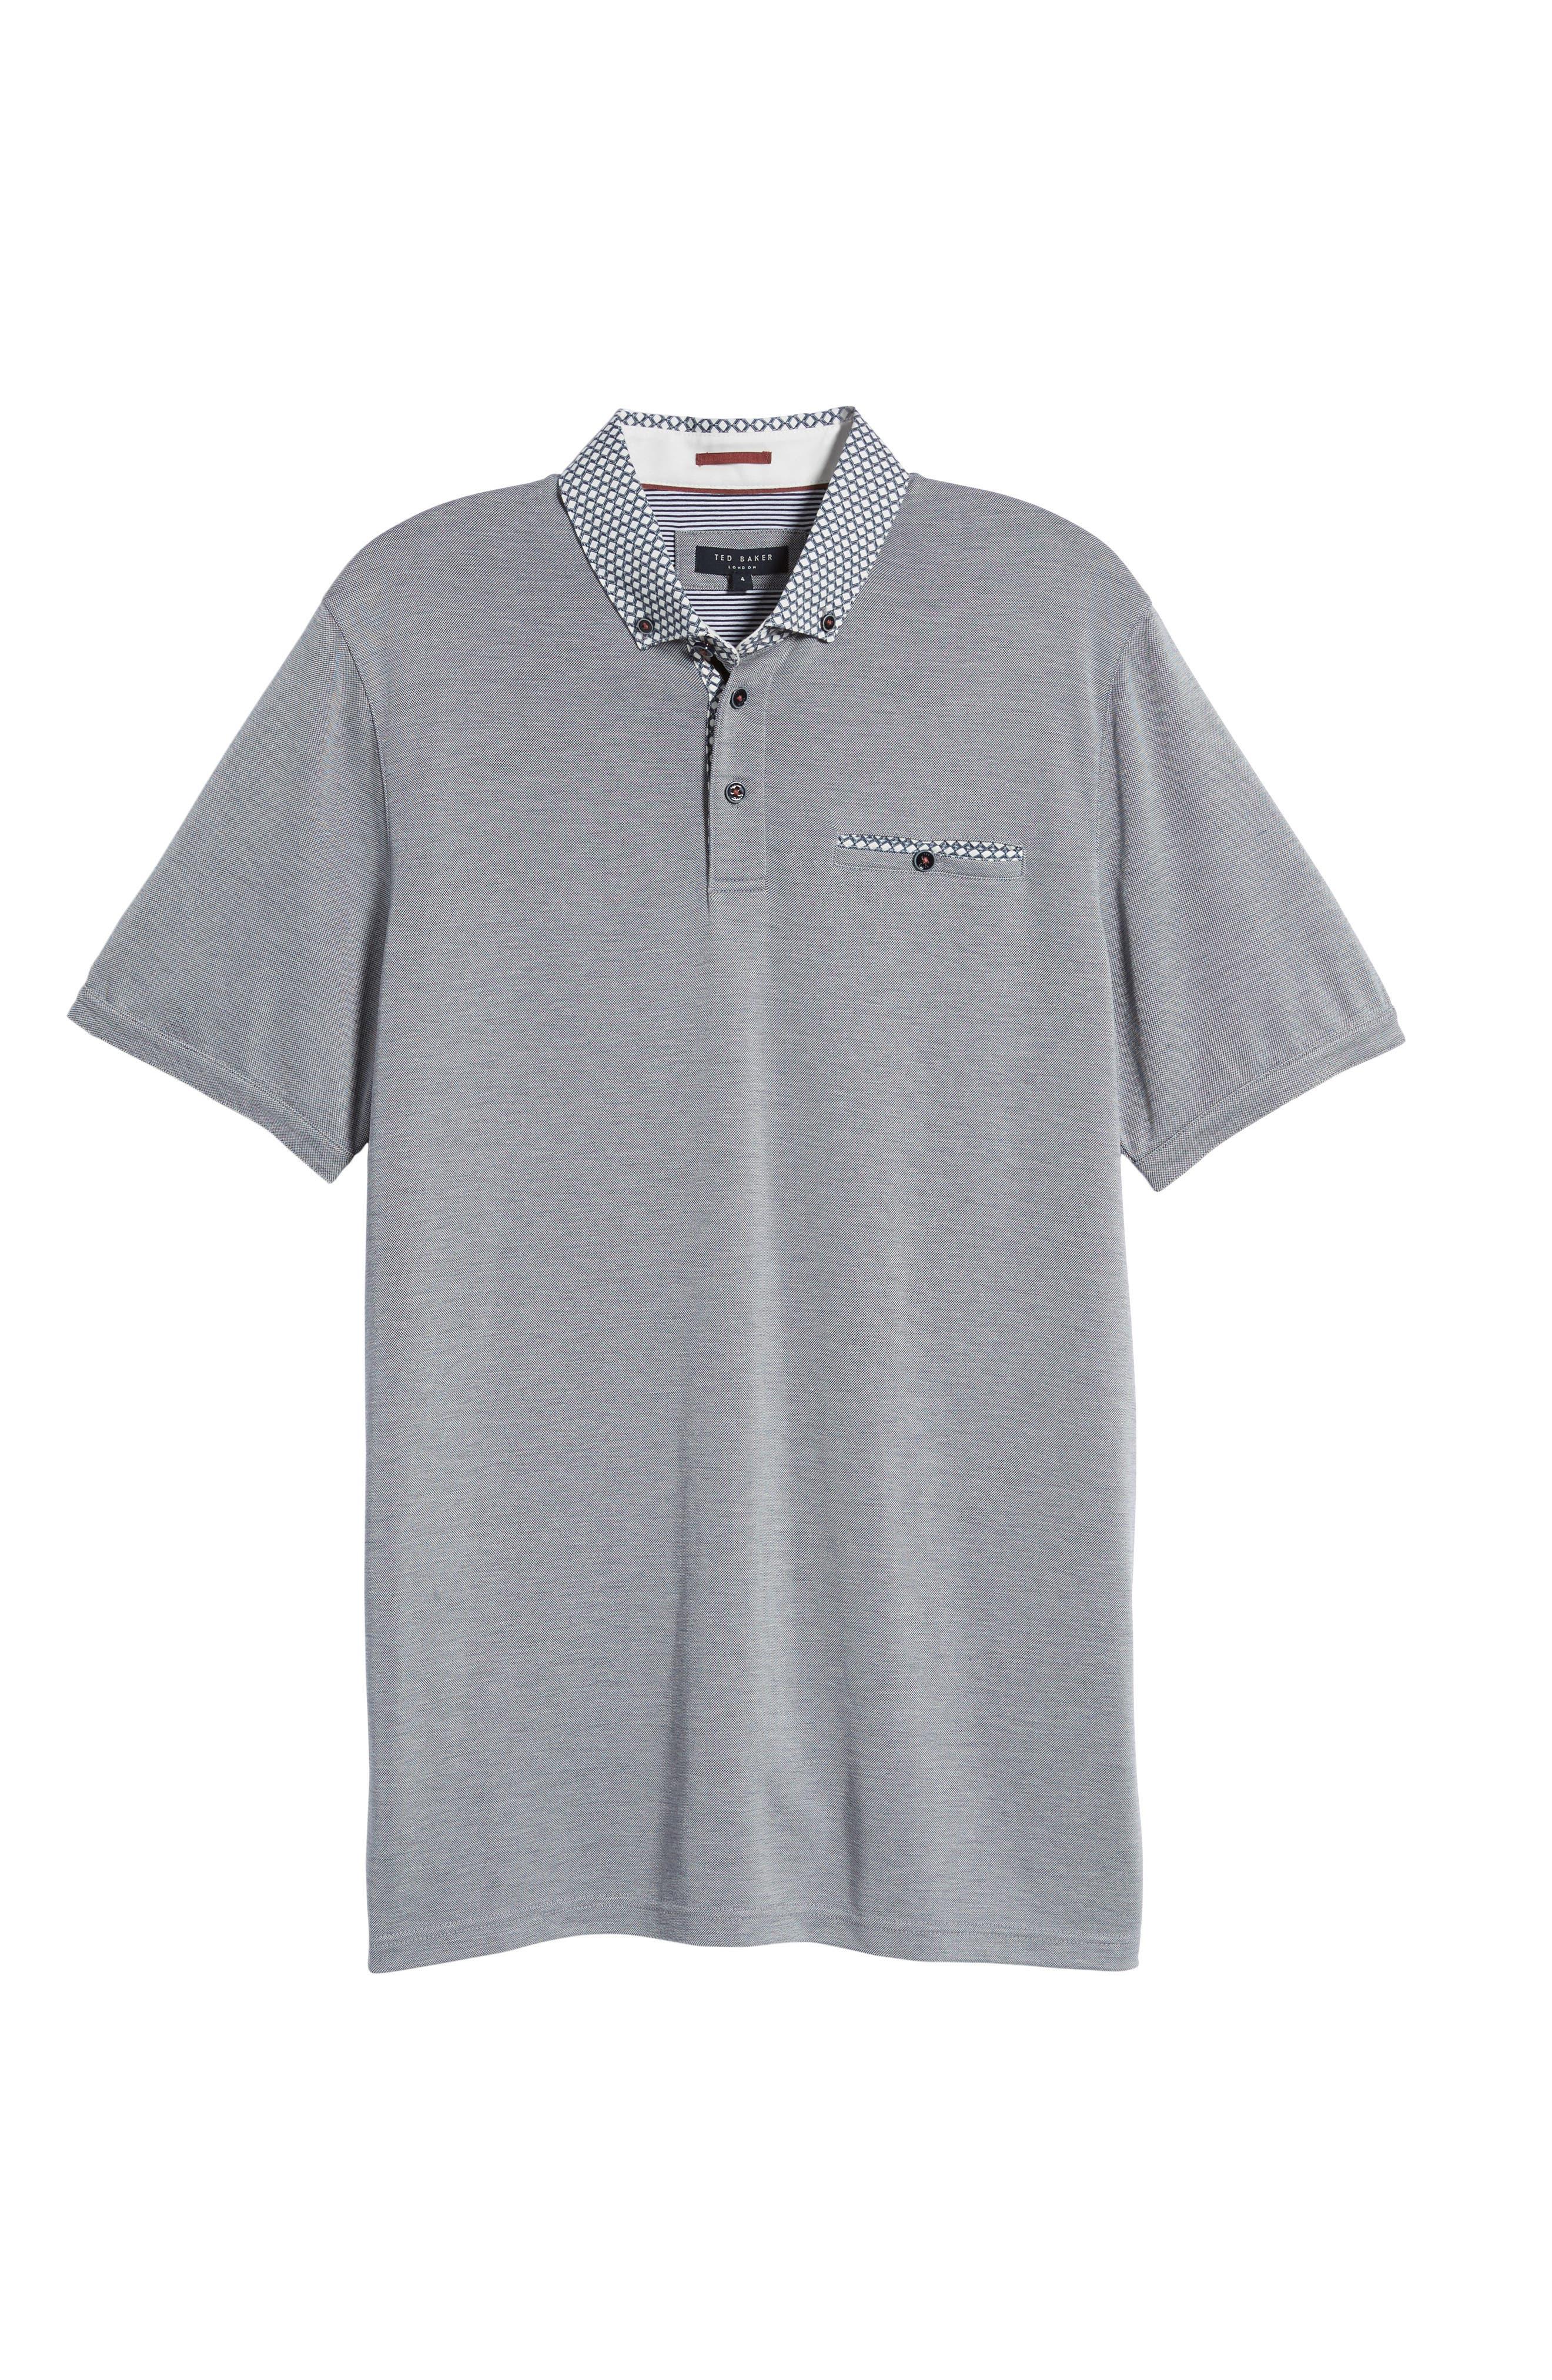 Tizu Trim Fit Polo Shirt,                             Alternate thumbnail 6, color,                             Navy